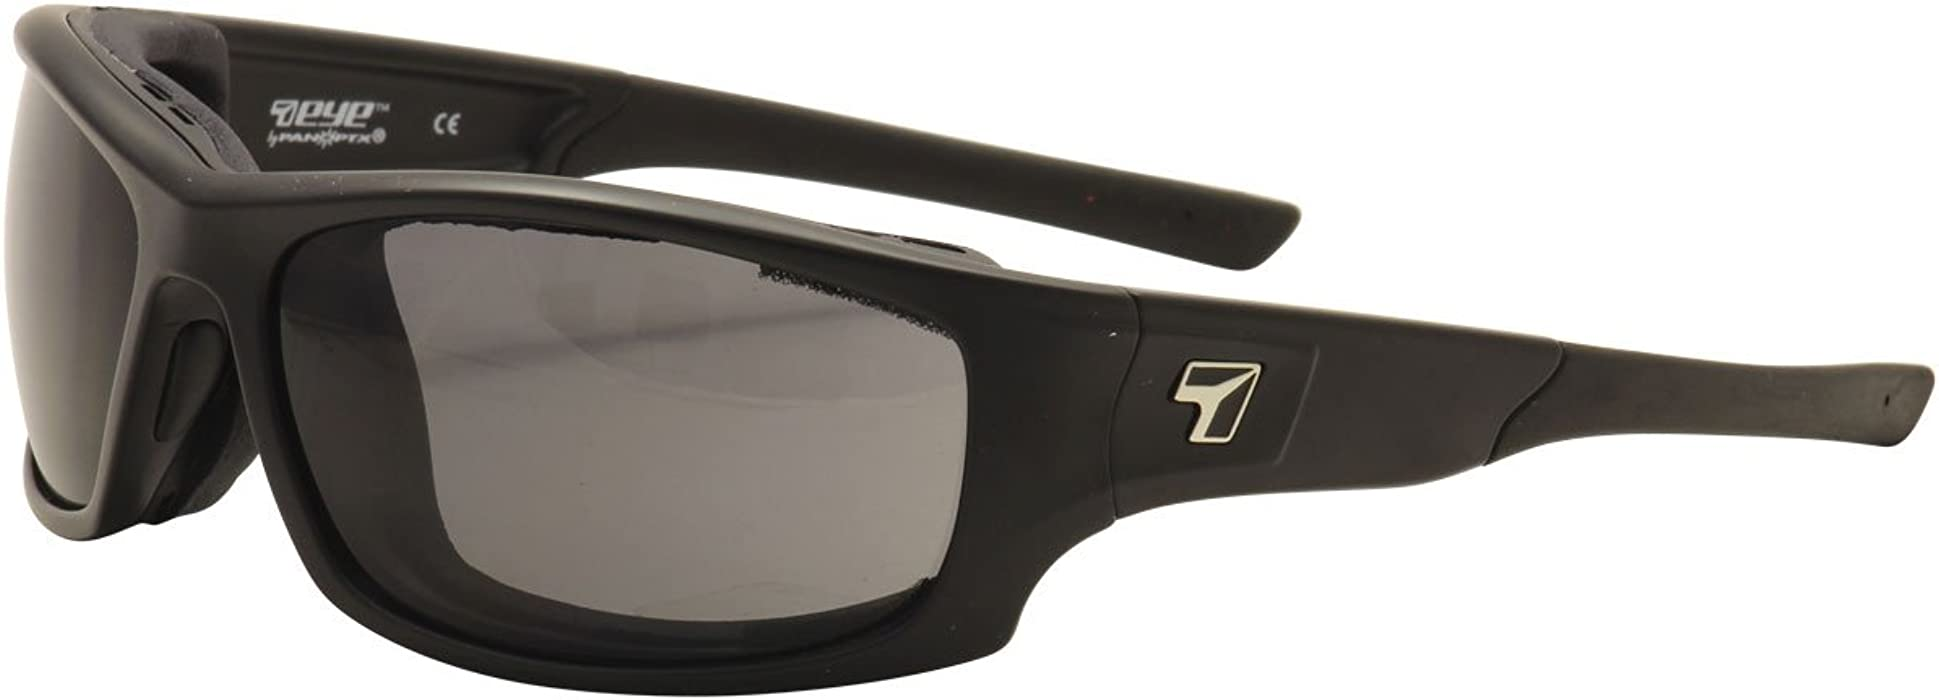 7Eye Airshield Panhead F-2601 Matte Black SharpView Gray Sunglasses Asian Fit